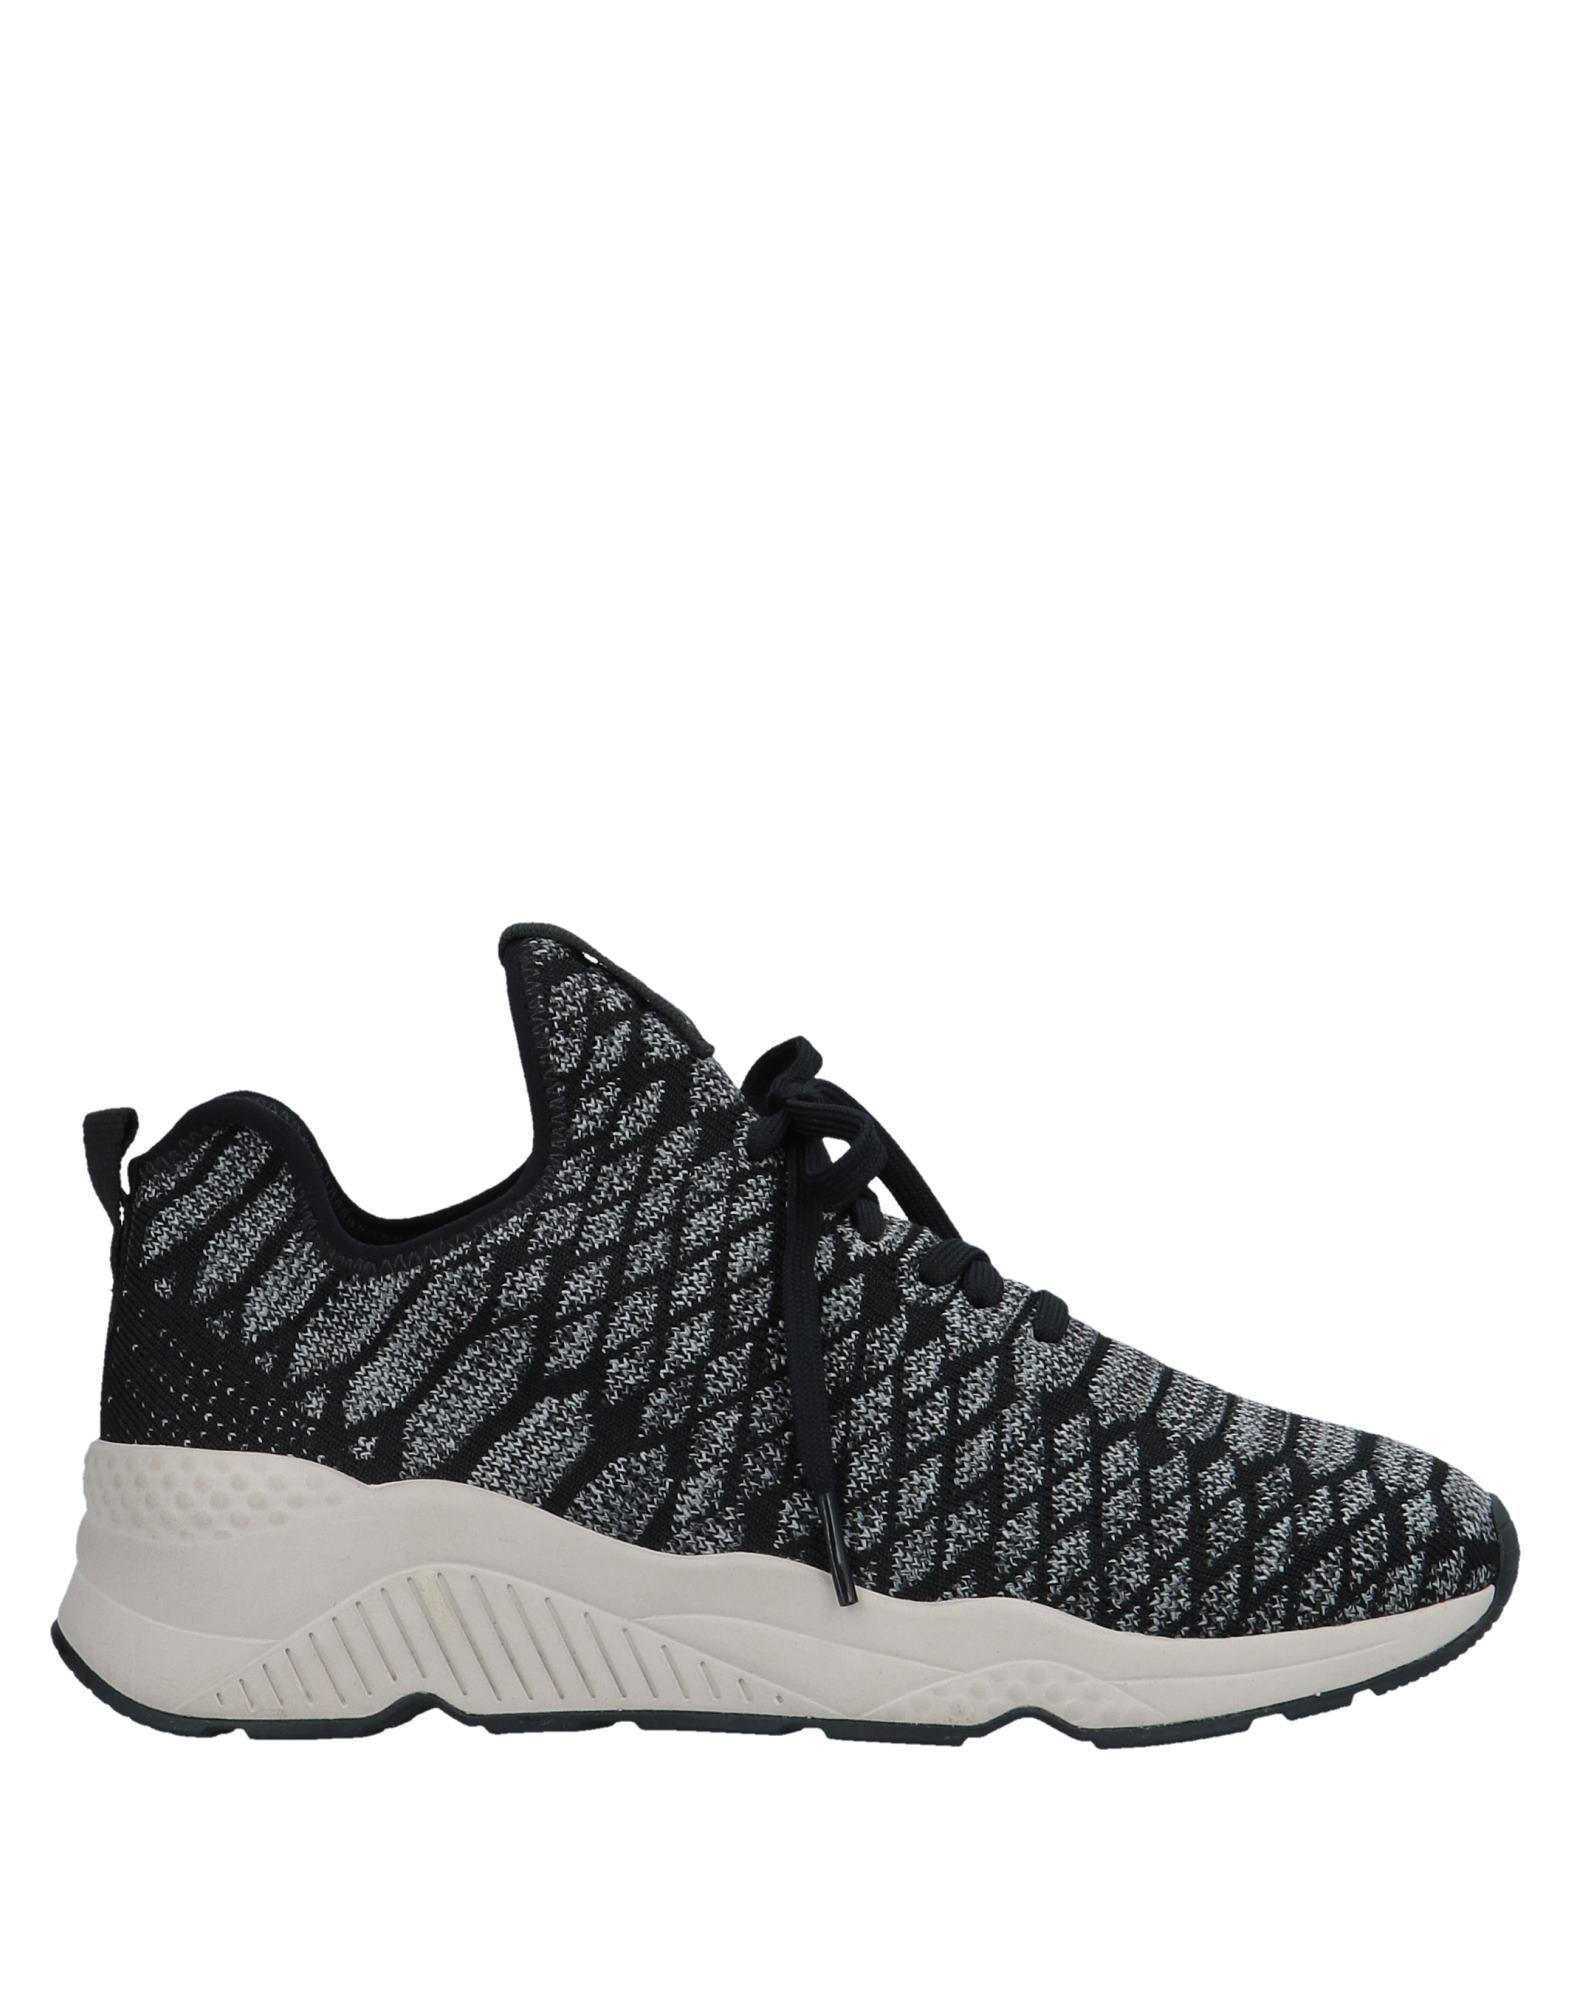 Ash Sneakers - Women  Ash Sneakers online on  Women Canada - 11557822BP aa3c03